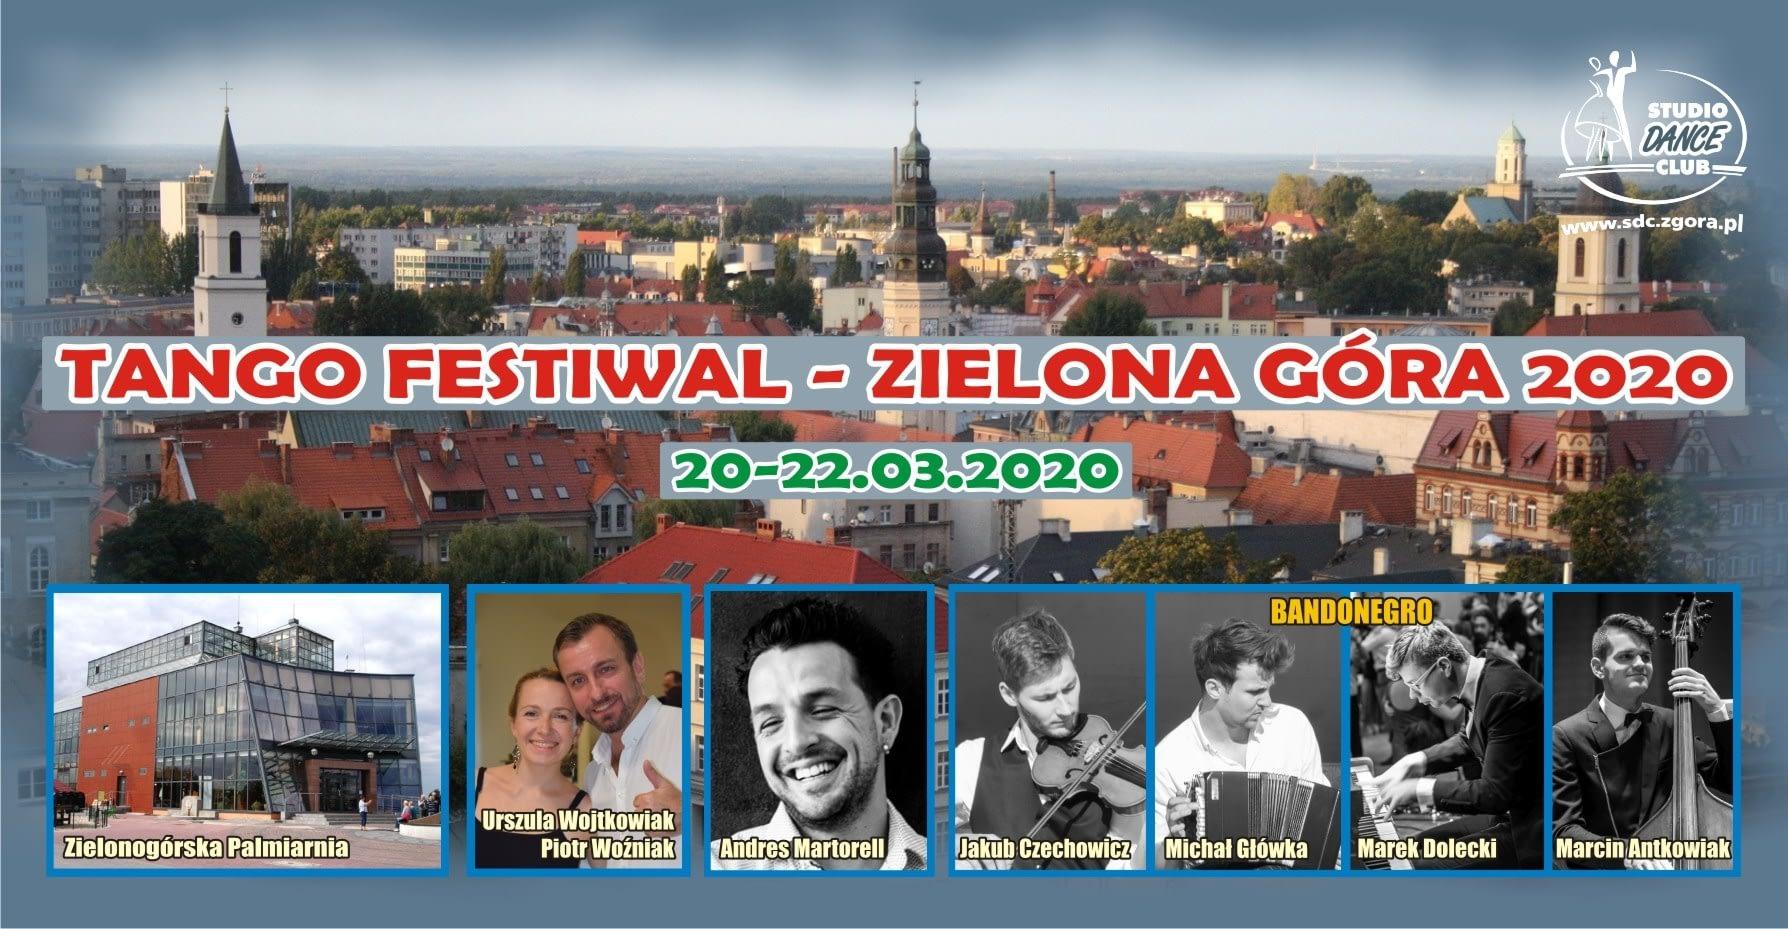 Festival Tango Zielona Gora